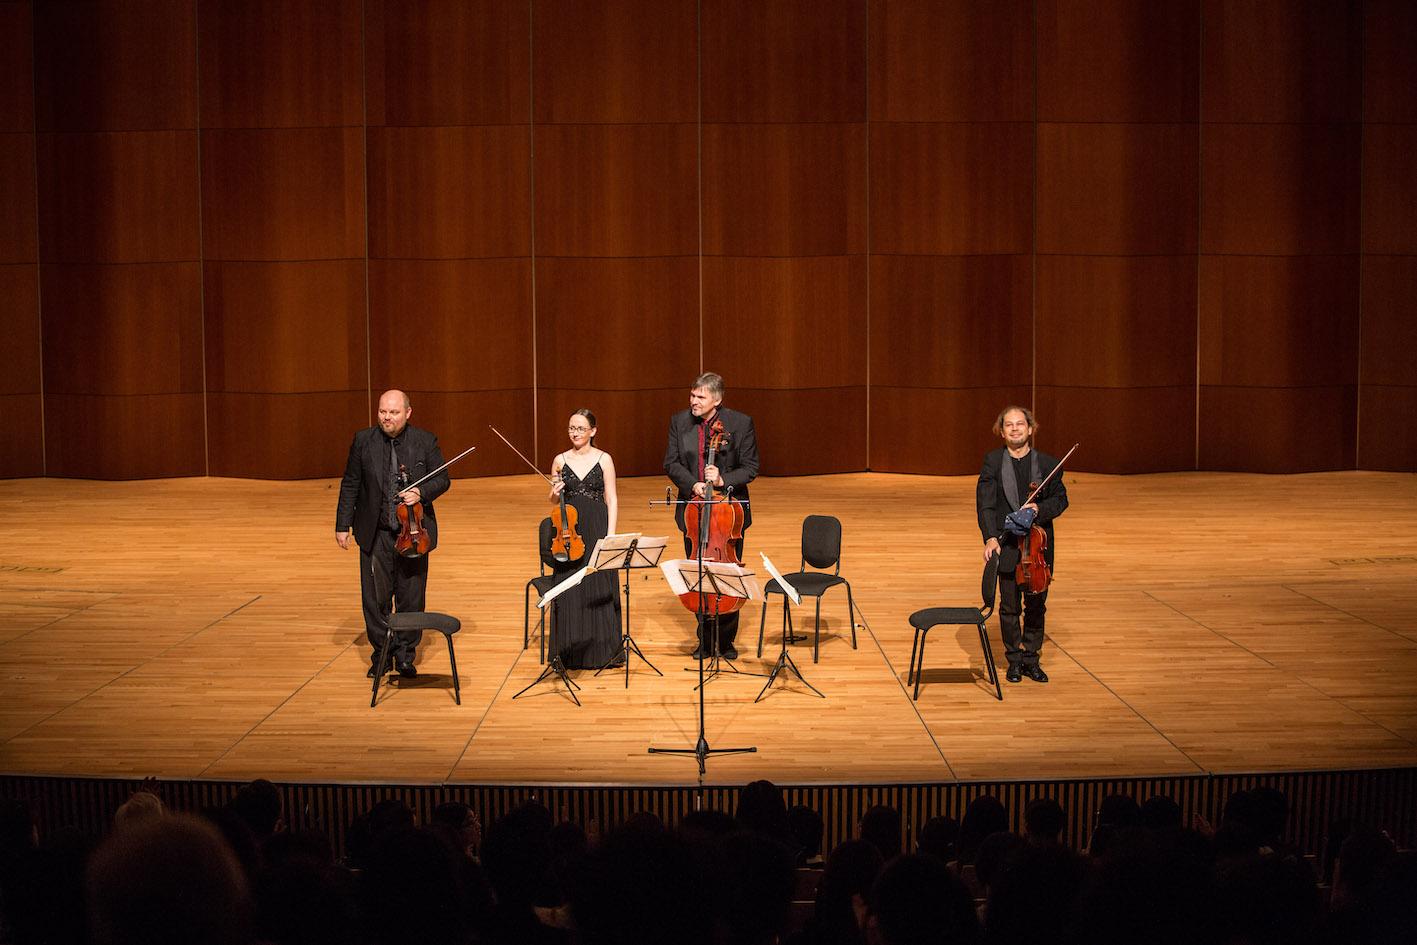 20160423-HKUCMT-Concert-019